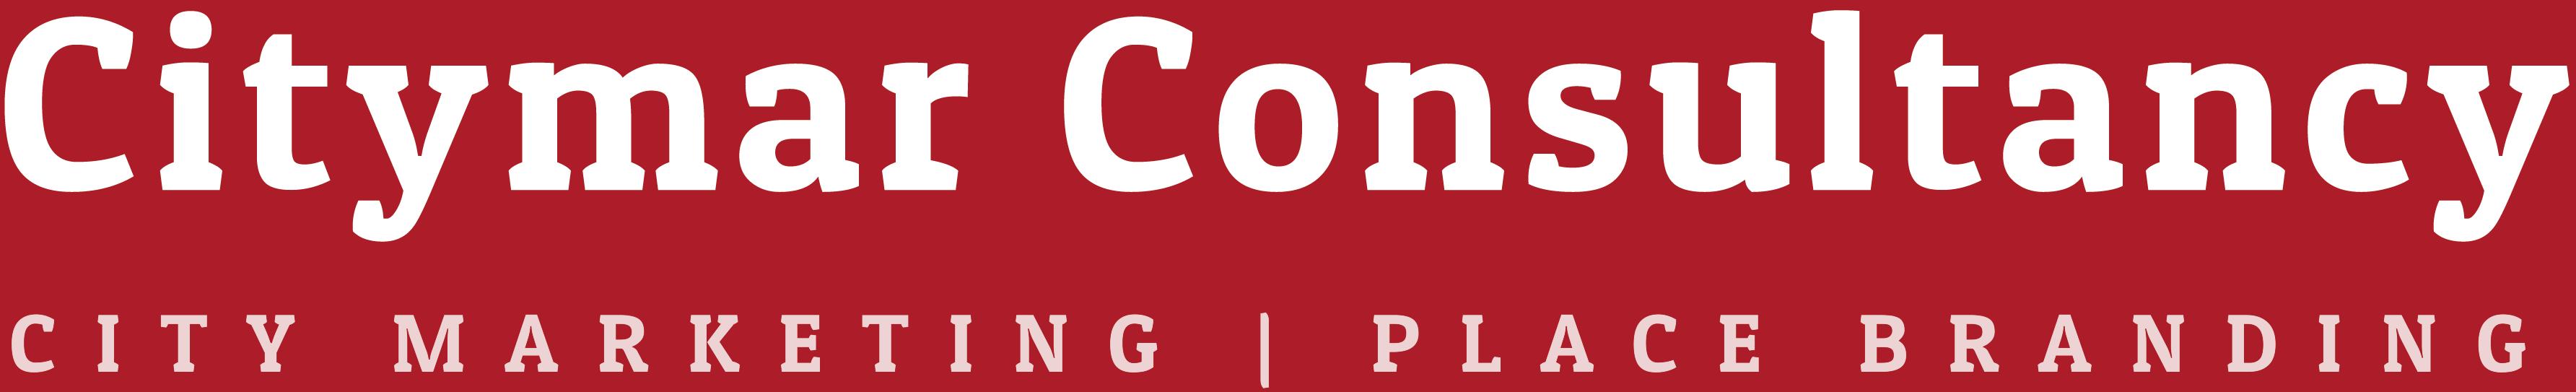 Citymar Consultancy logo